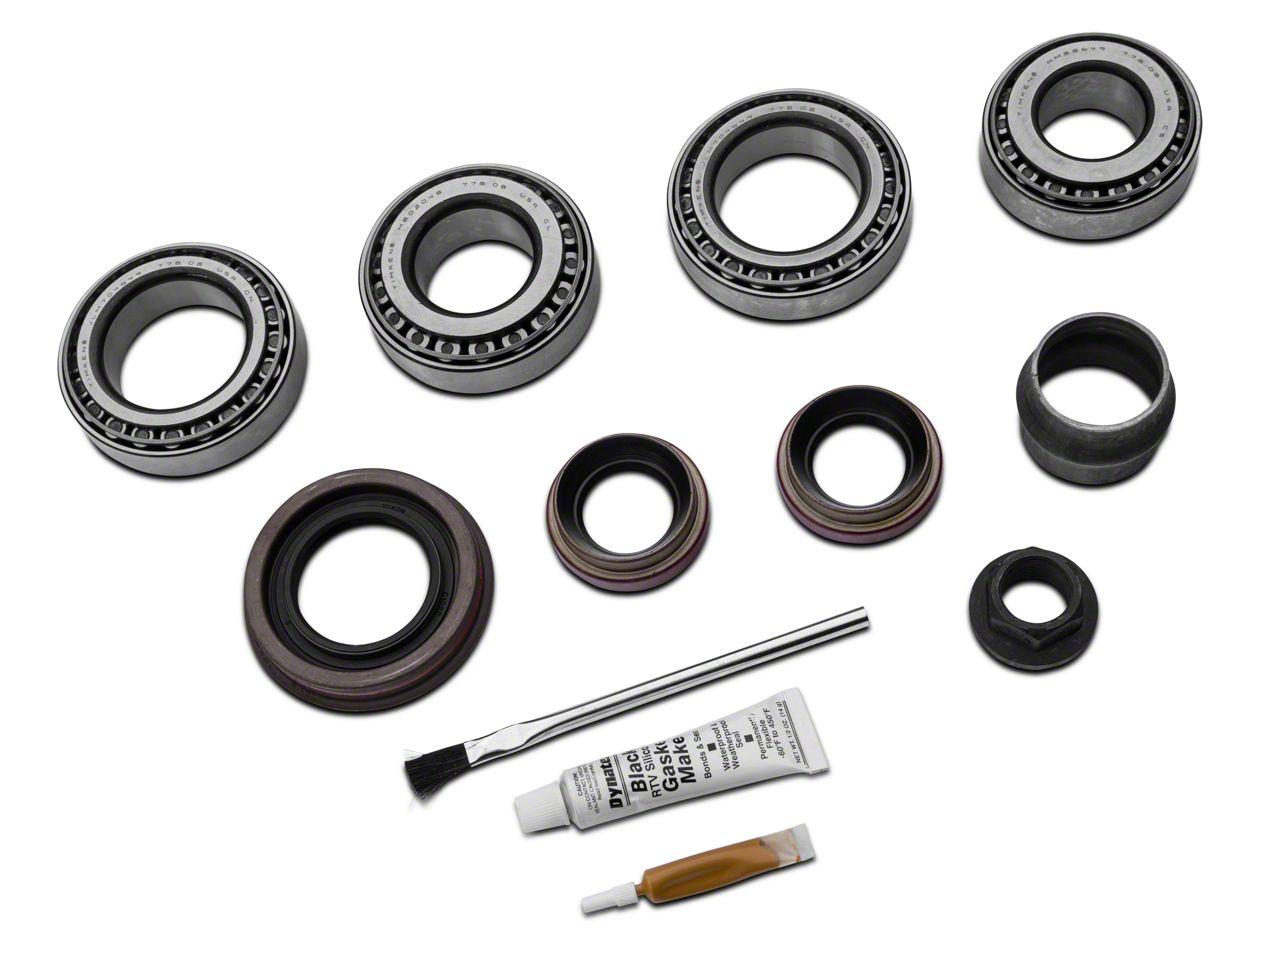 Yukon Gear Front Dana 44 Bearing Install Kit (07-18 Jeep Wrangler JK Rubicon)